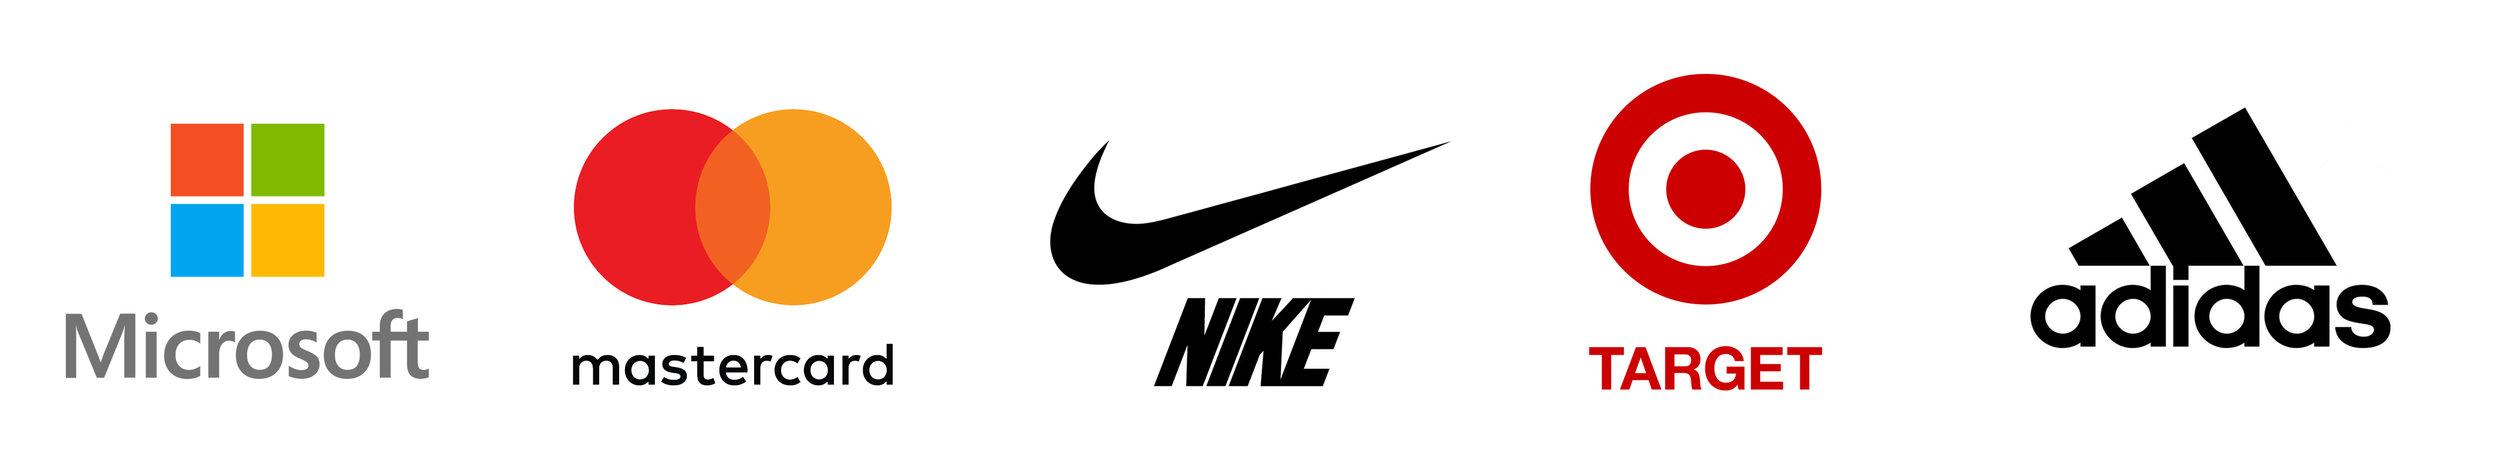 Logos-with-name.jpg